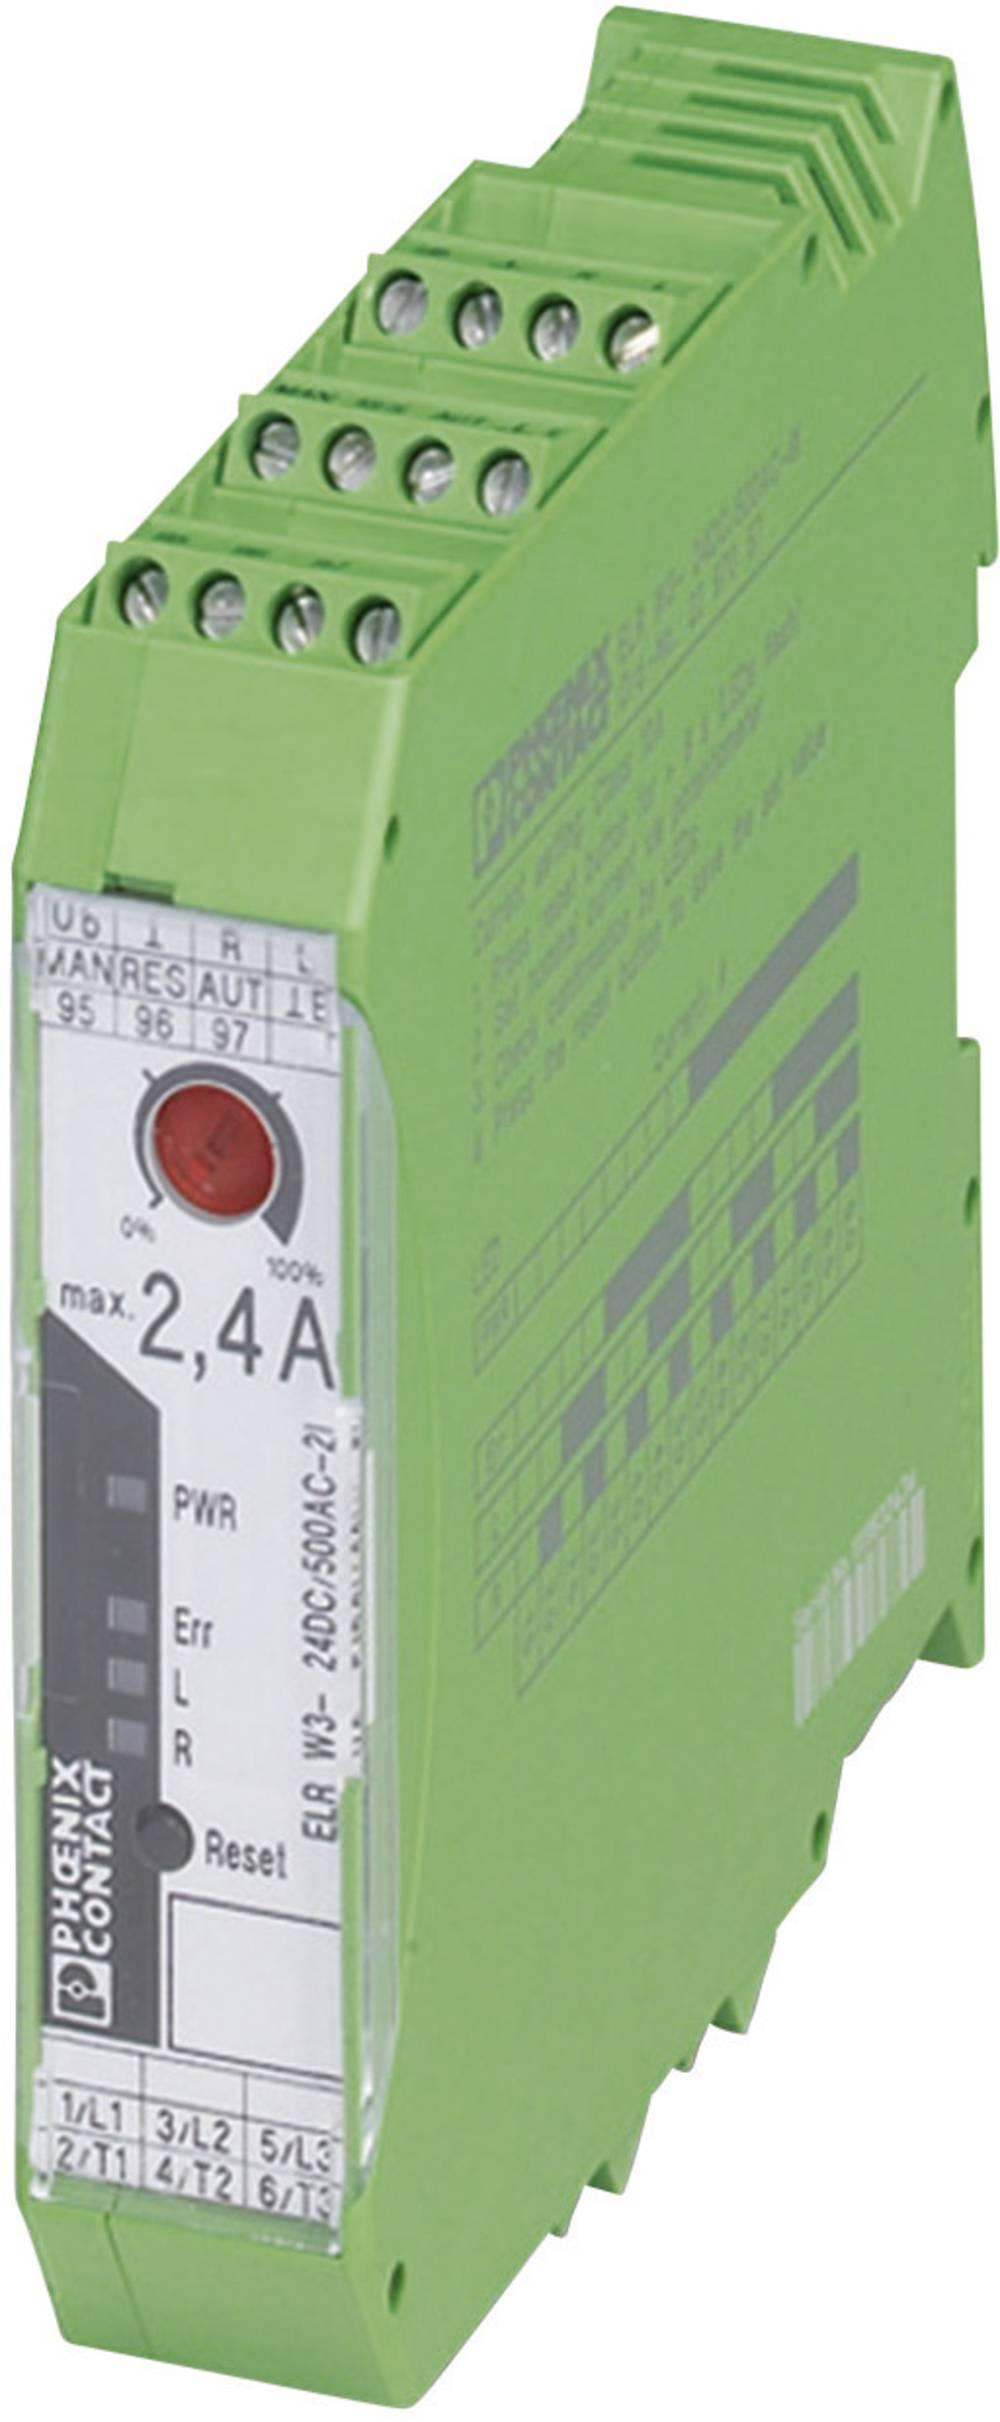 Vendekontaktor 1 stk ELR W3- 24DC/500AC- 2I-BR Phoenix Contact 24 V/DC 2.4 A